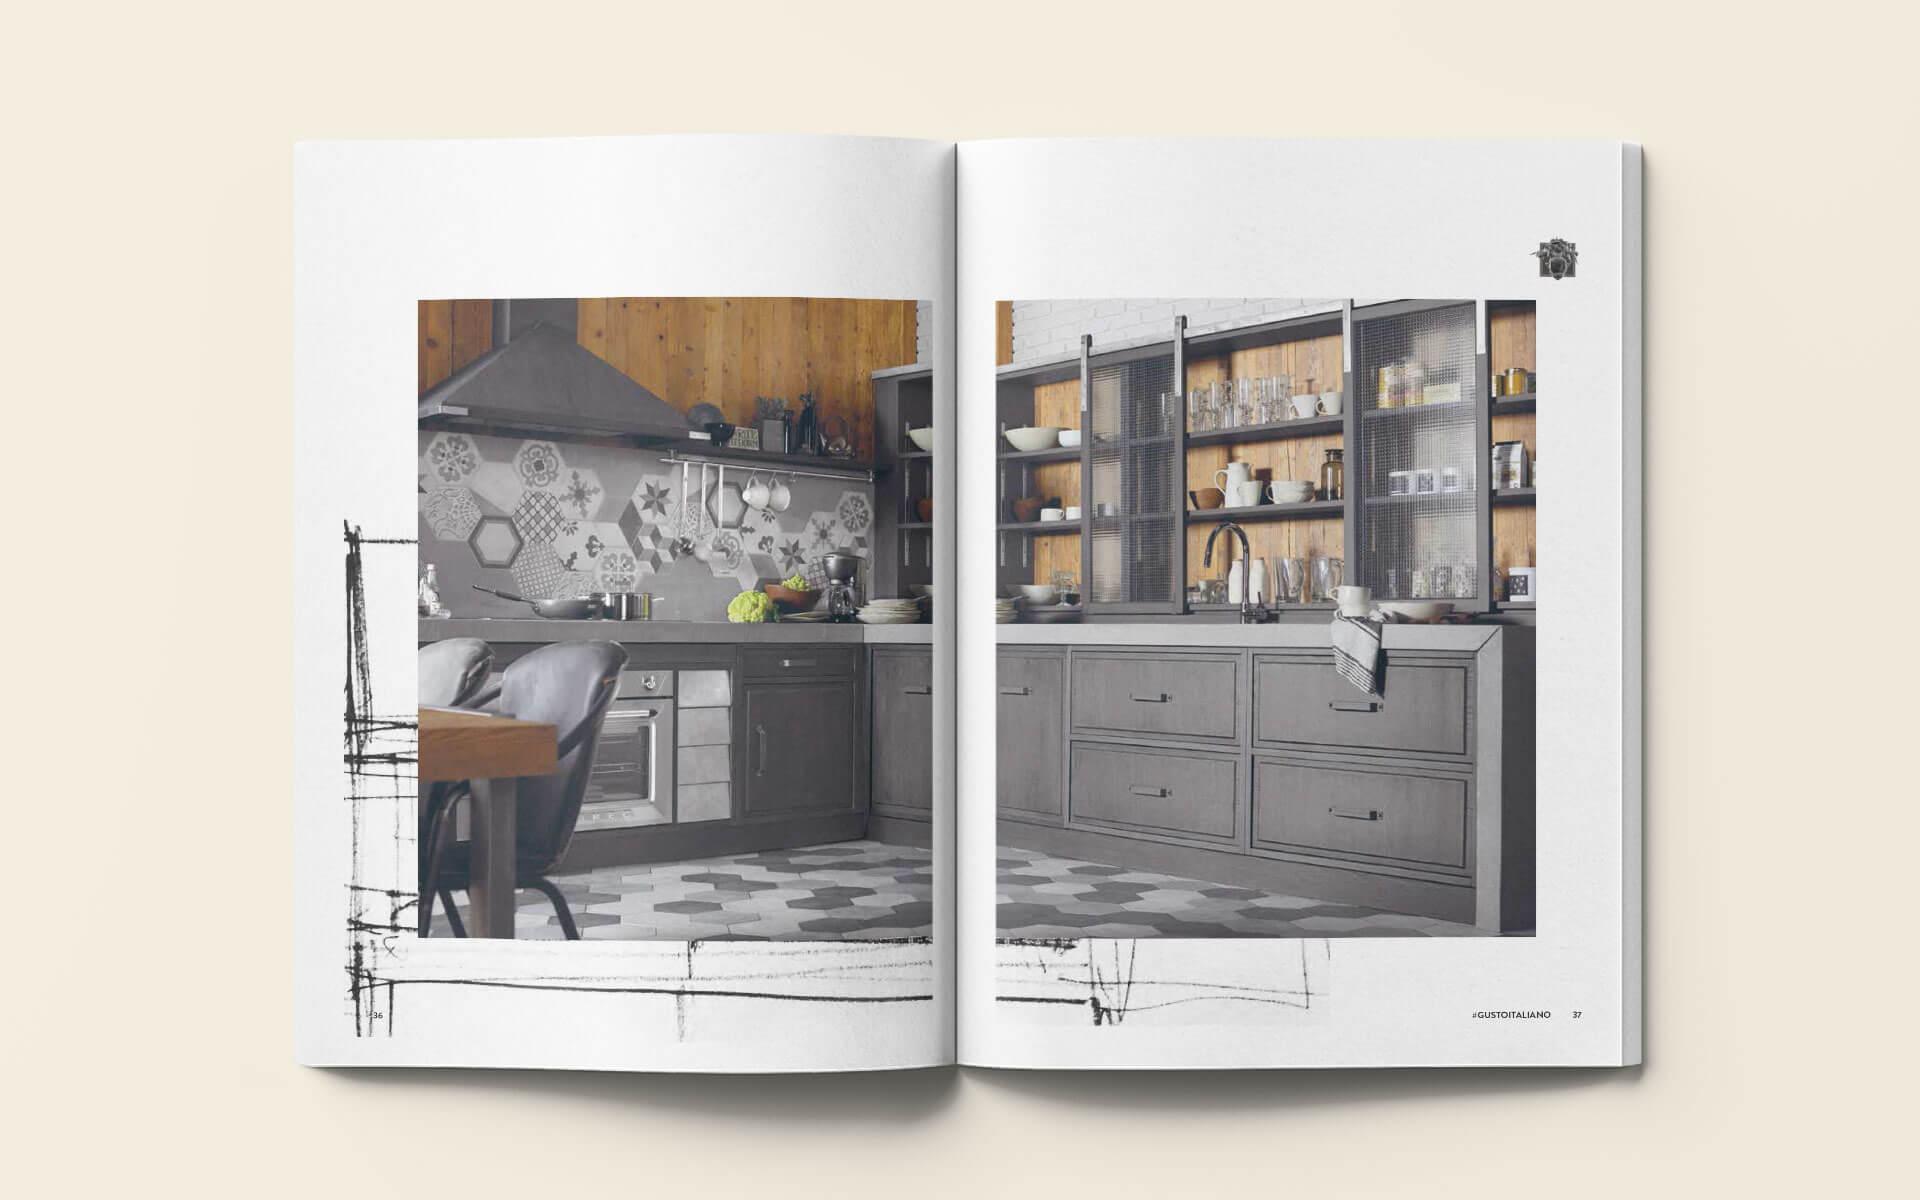 Catalogo Bellagio - Marchi Cucine Made in Italy